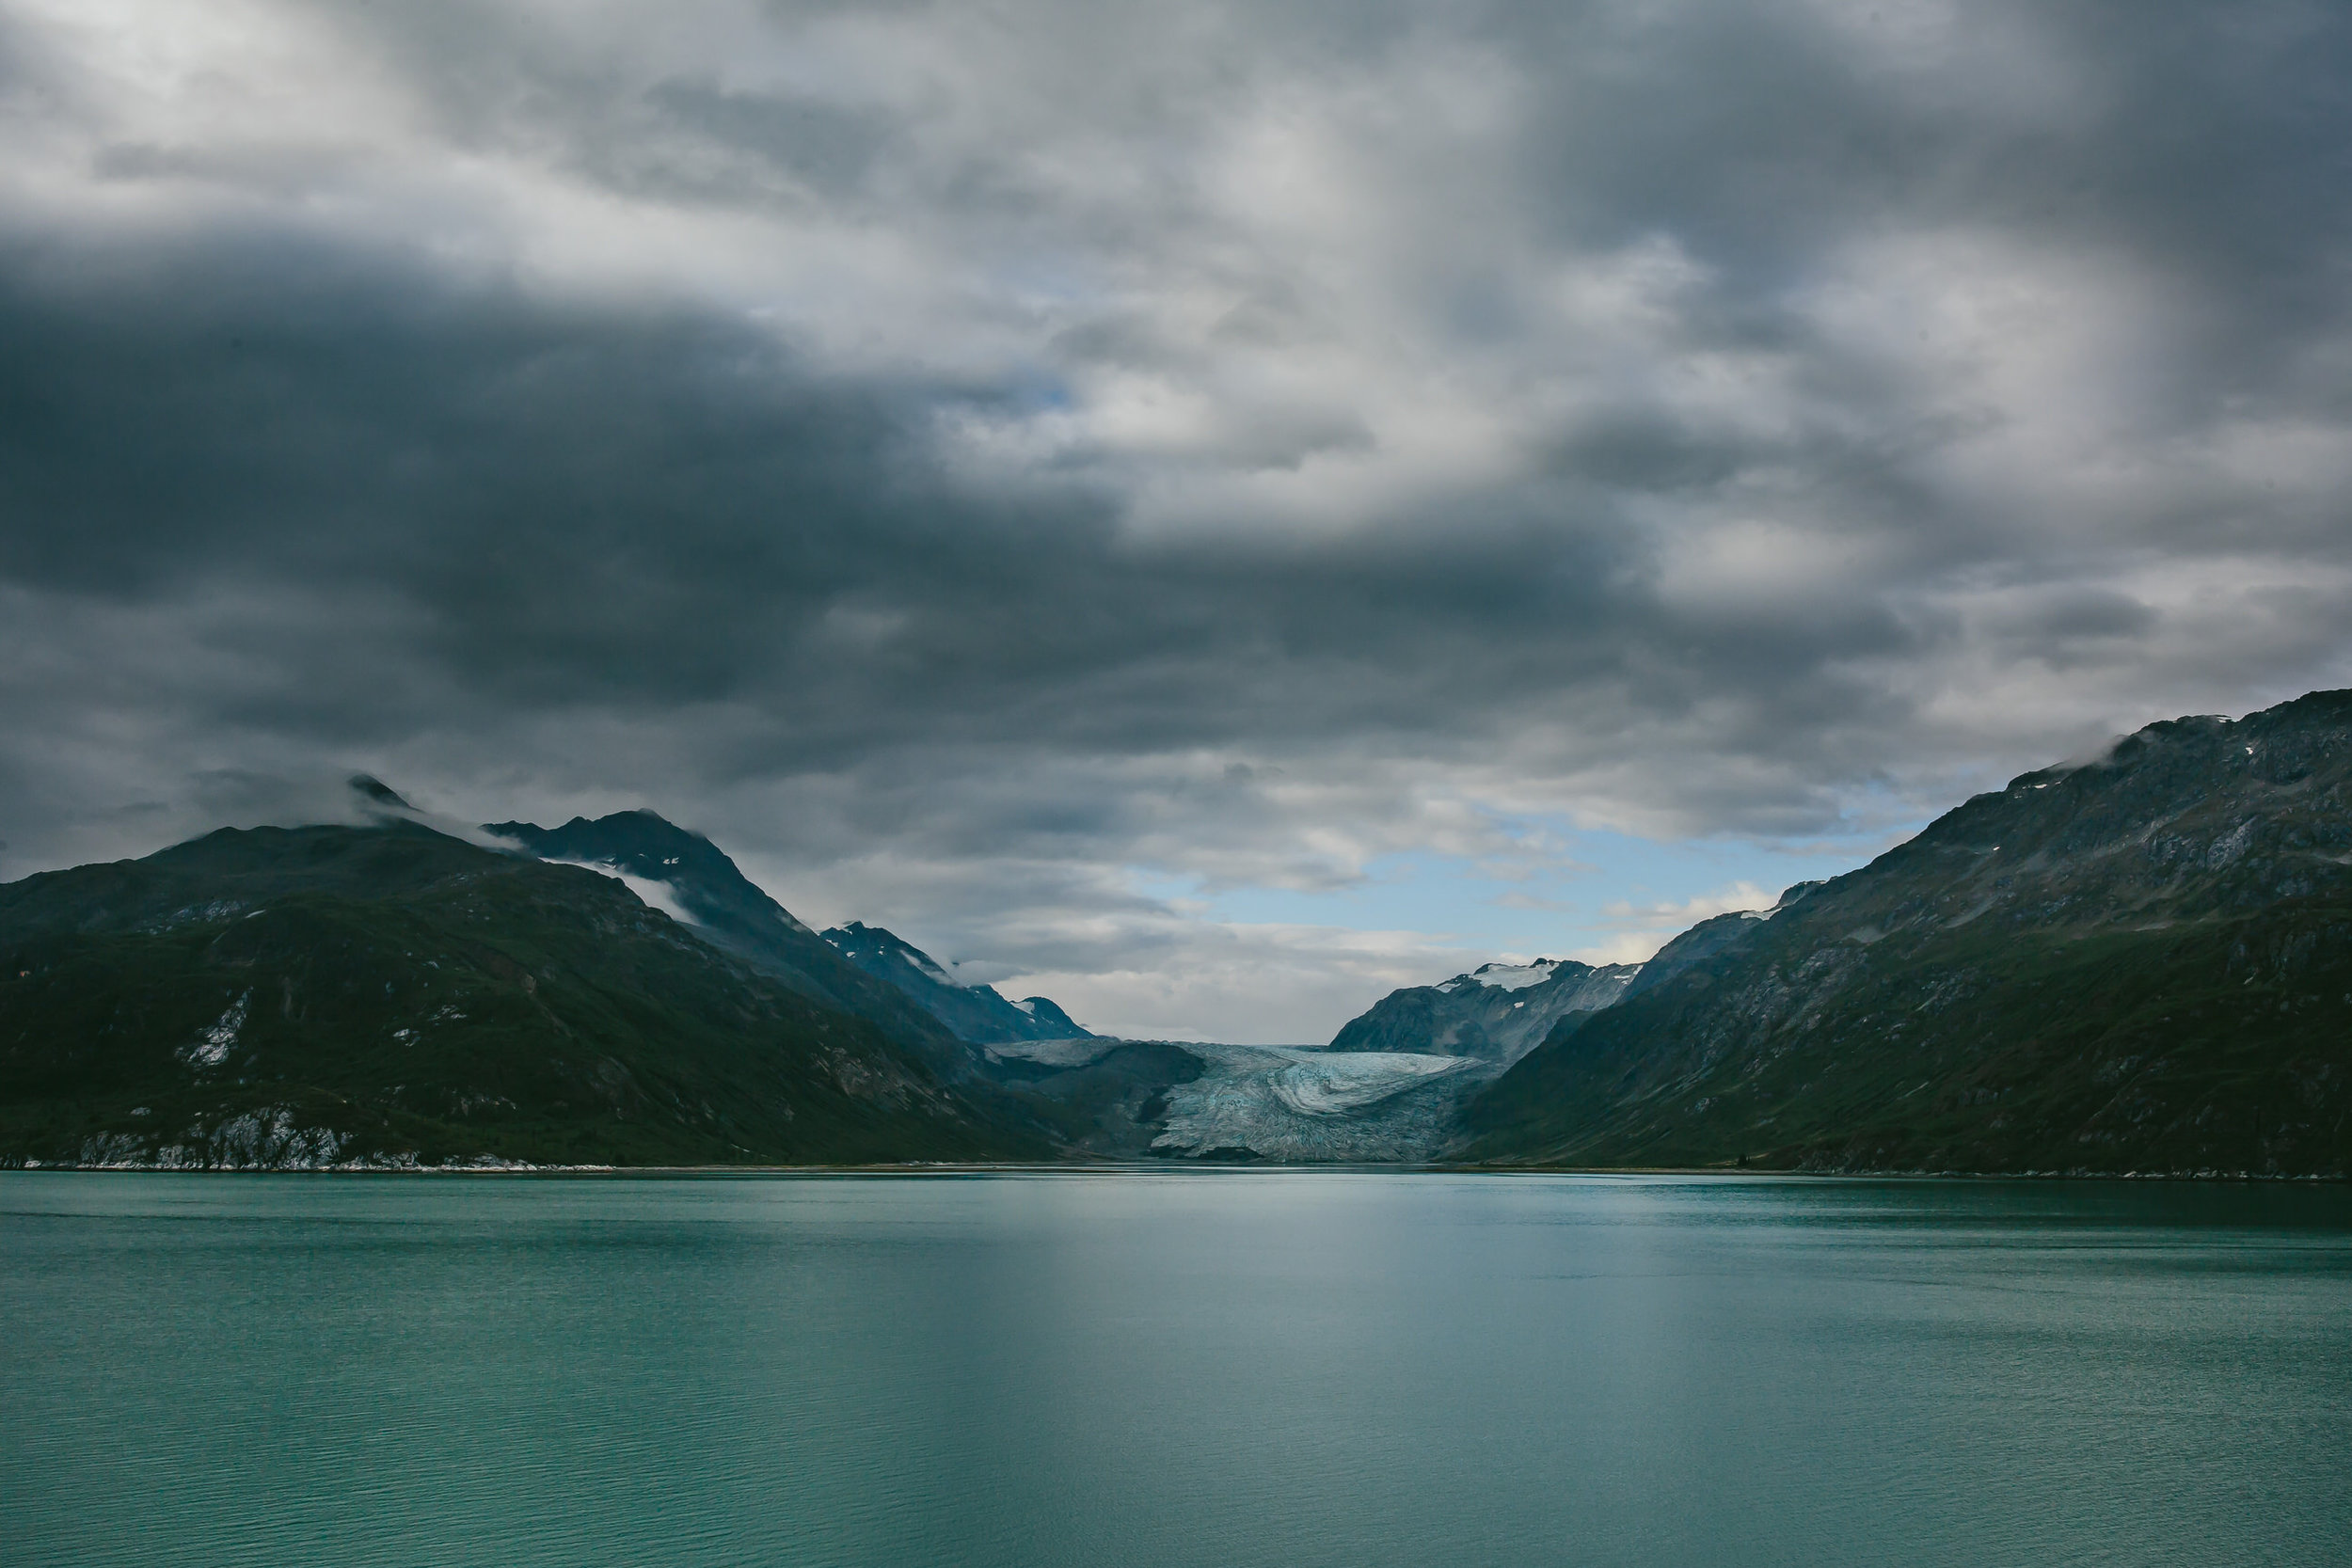 glaciers_glacier_bay_tiny_house_photo_travel_adventures-1.jpg